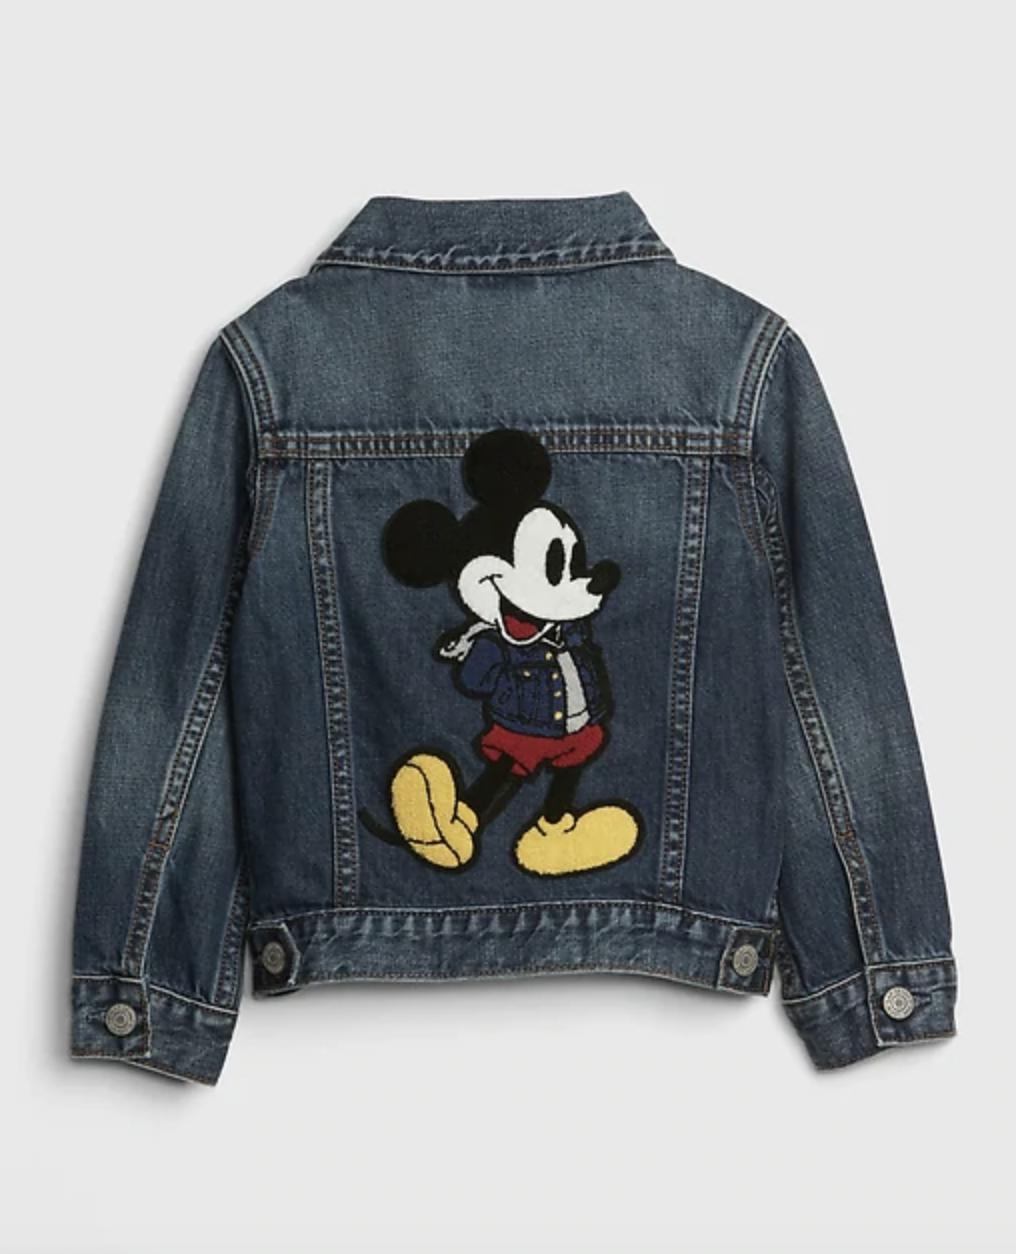 Babygap Disney Mickey Mouse Icon Denim Jacket Mickey Mouse Outfit Denim Jacket Disney Toddler Outfits [ 1254 x 1016 Pixel ]